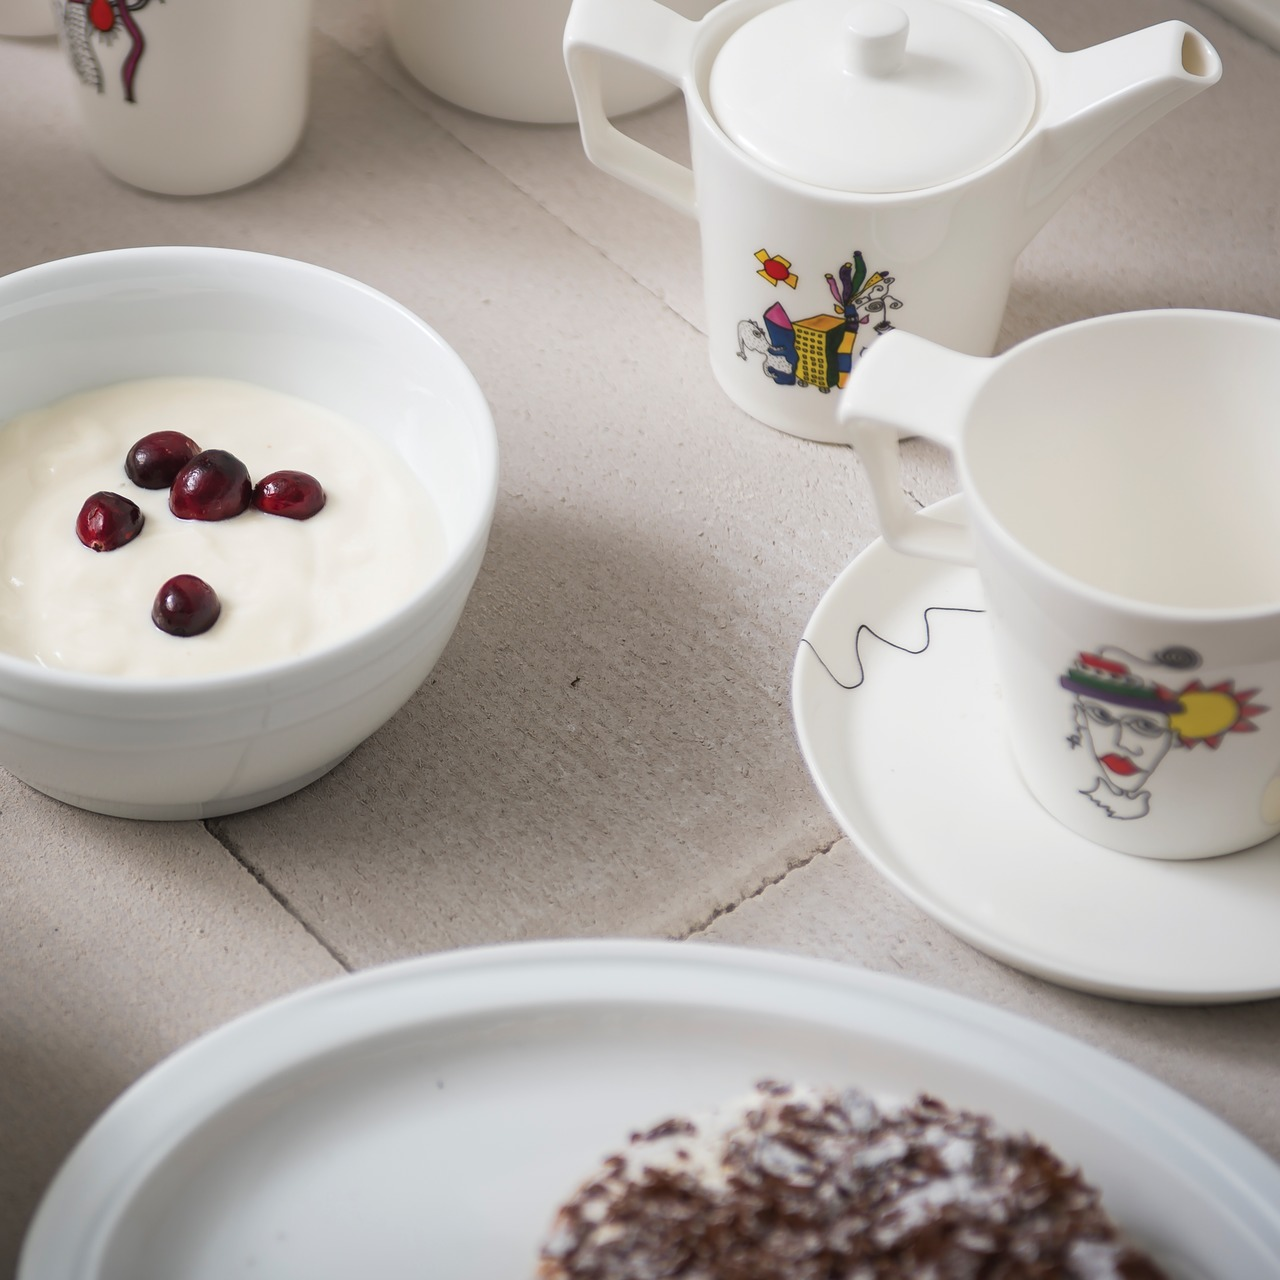 Фото Набор кружек для кофе 370 мл BergHOFF Eclipse ornament 2 шт